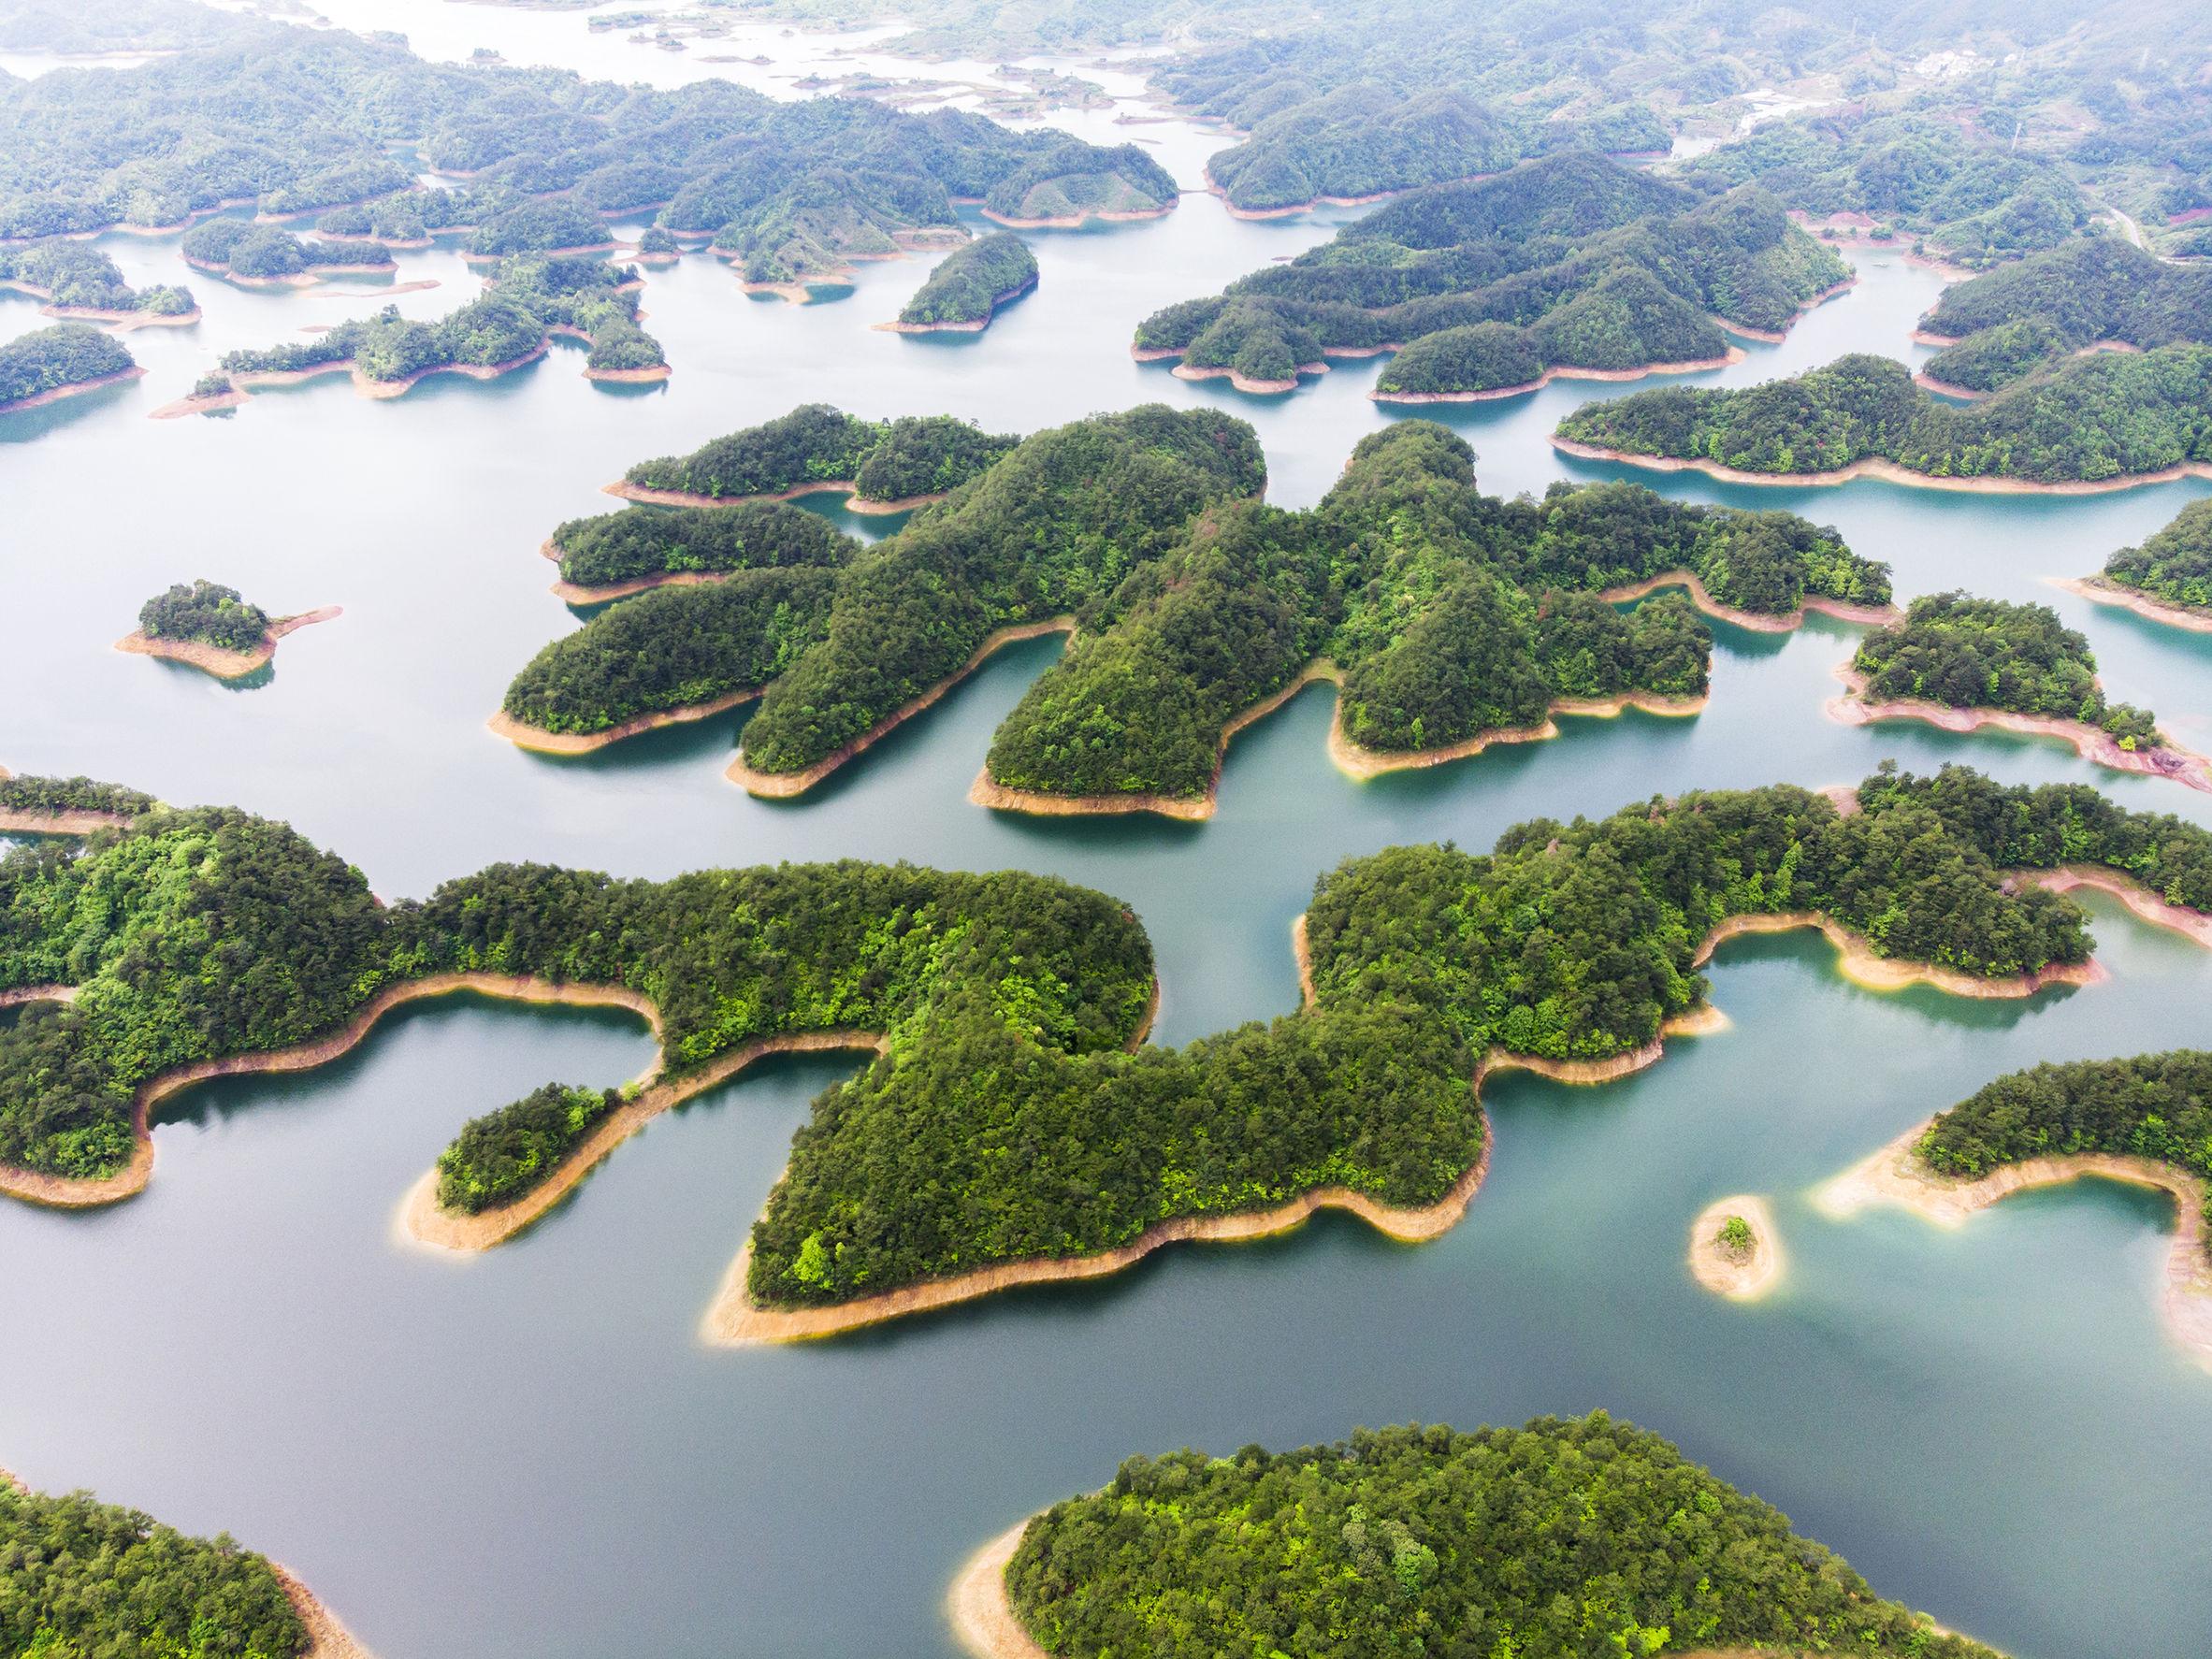 jezioro-qiandao.jpg